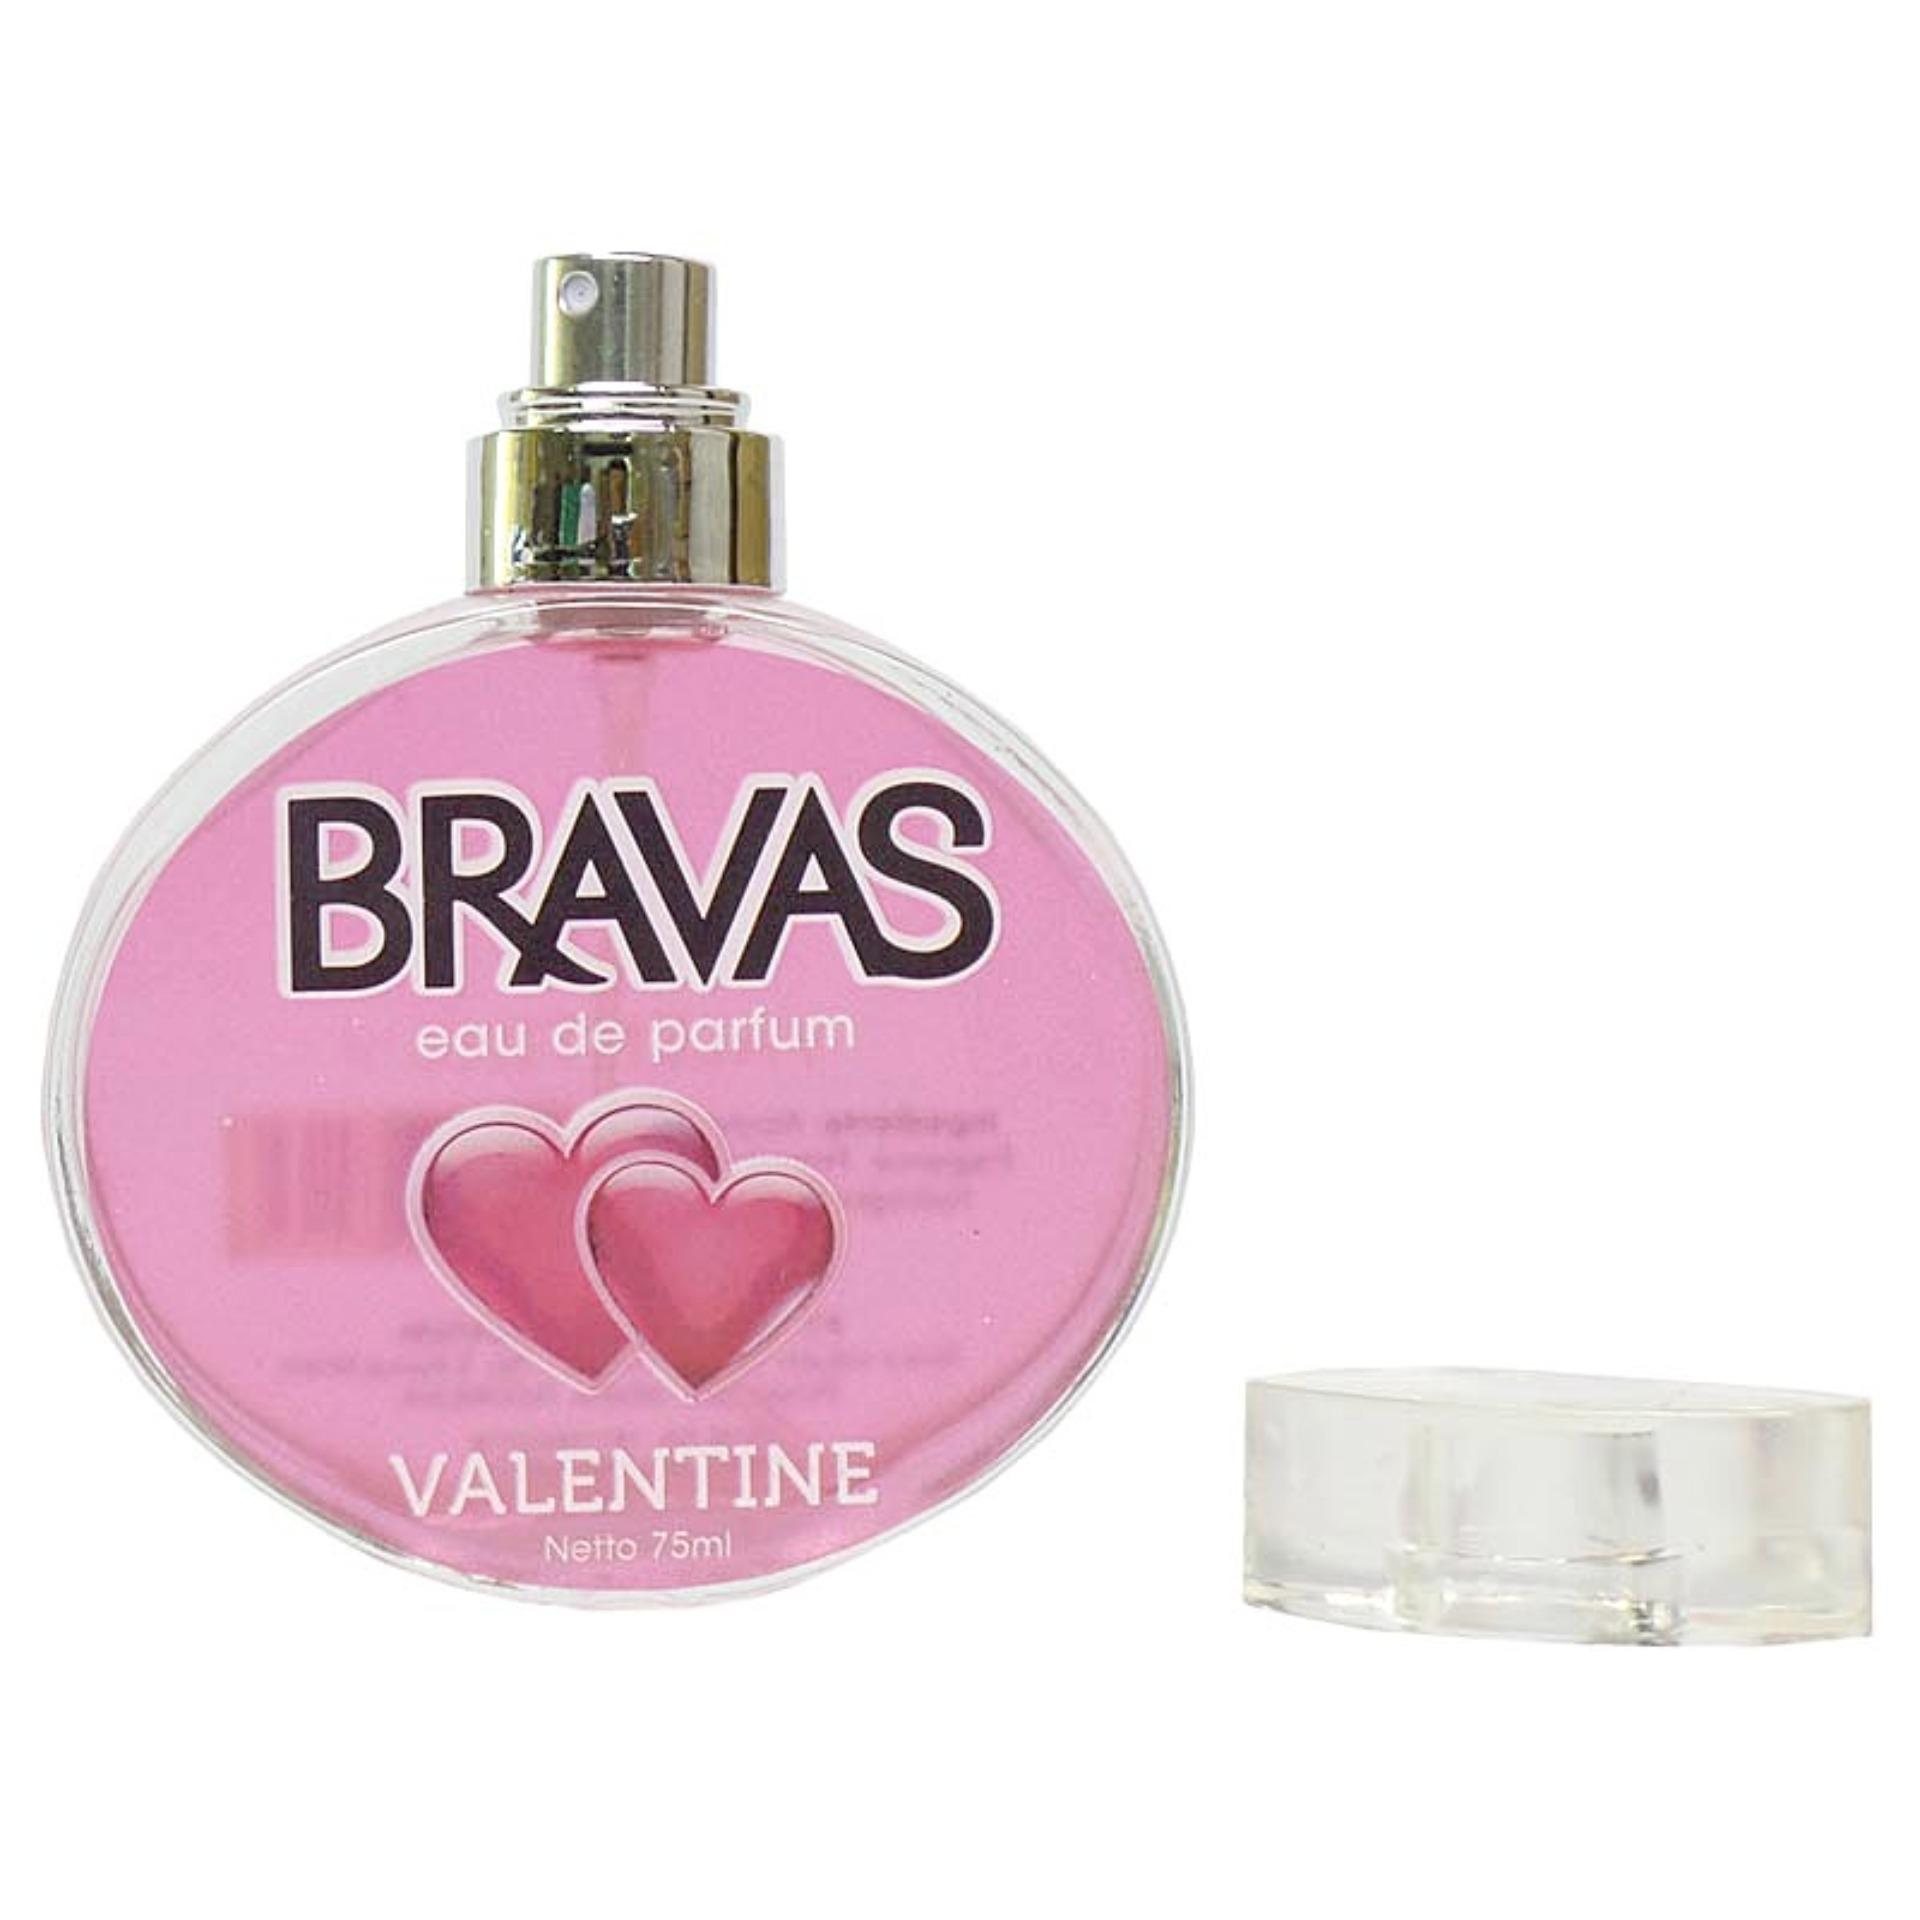 Parfum BRASOV Fresh original Eau De Parfum 50 ml perfume cologne Merah. Source · BRAVAS Original Valentine Perfume XX-CT-670132 Eau De Parfum 75 ML - Pink